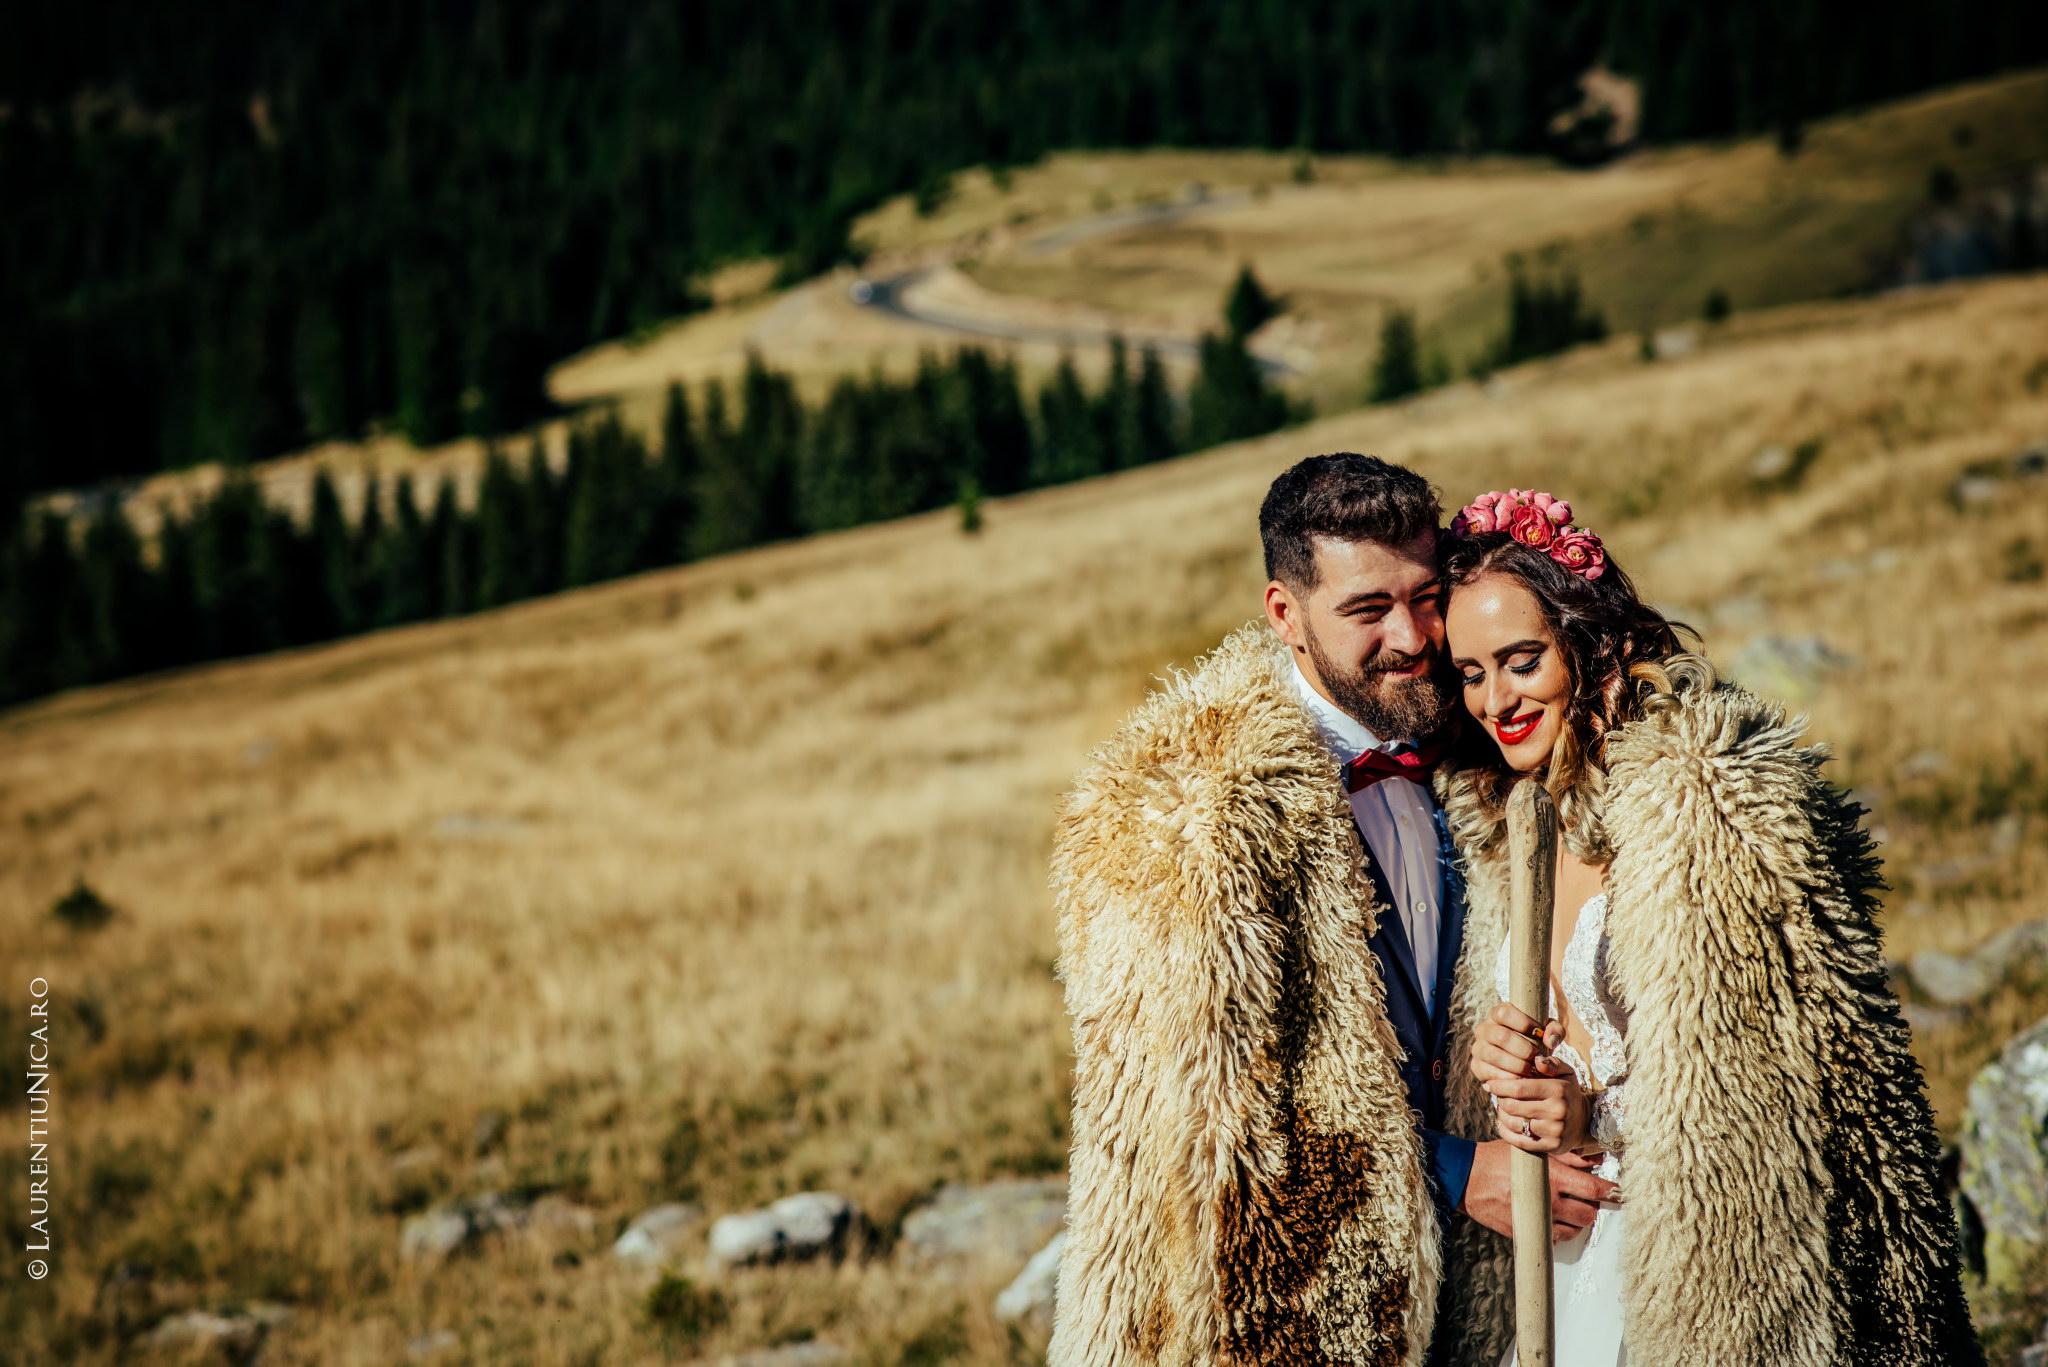 aida si alin fotograf nunta laurentiu nica transalpina 03 - Aida & Alin | Fotografii After Wedding | Transalpina - Muntii Parang